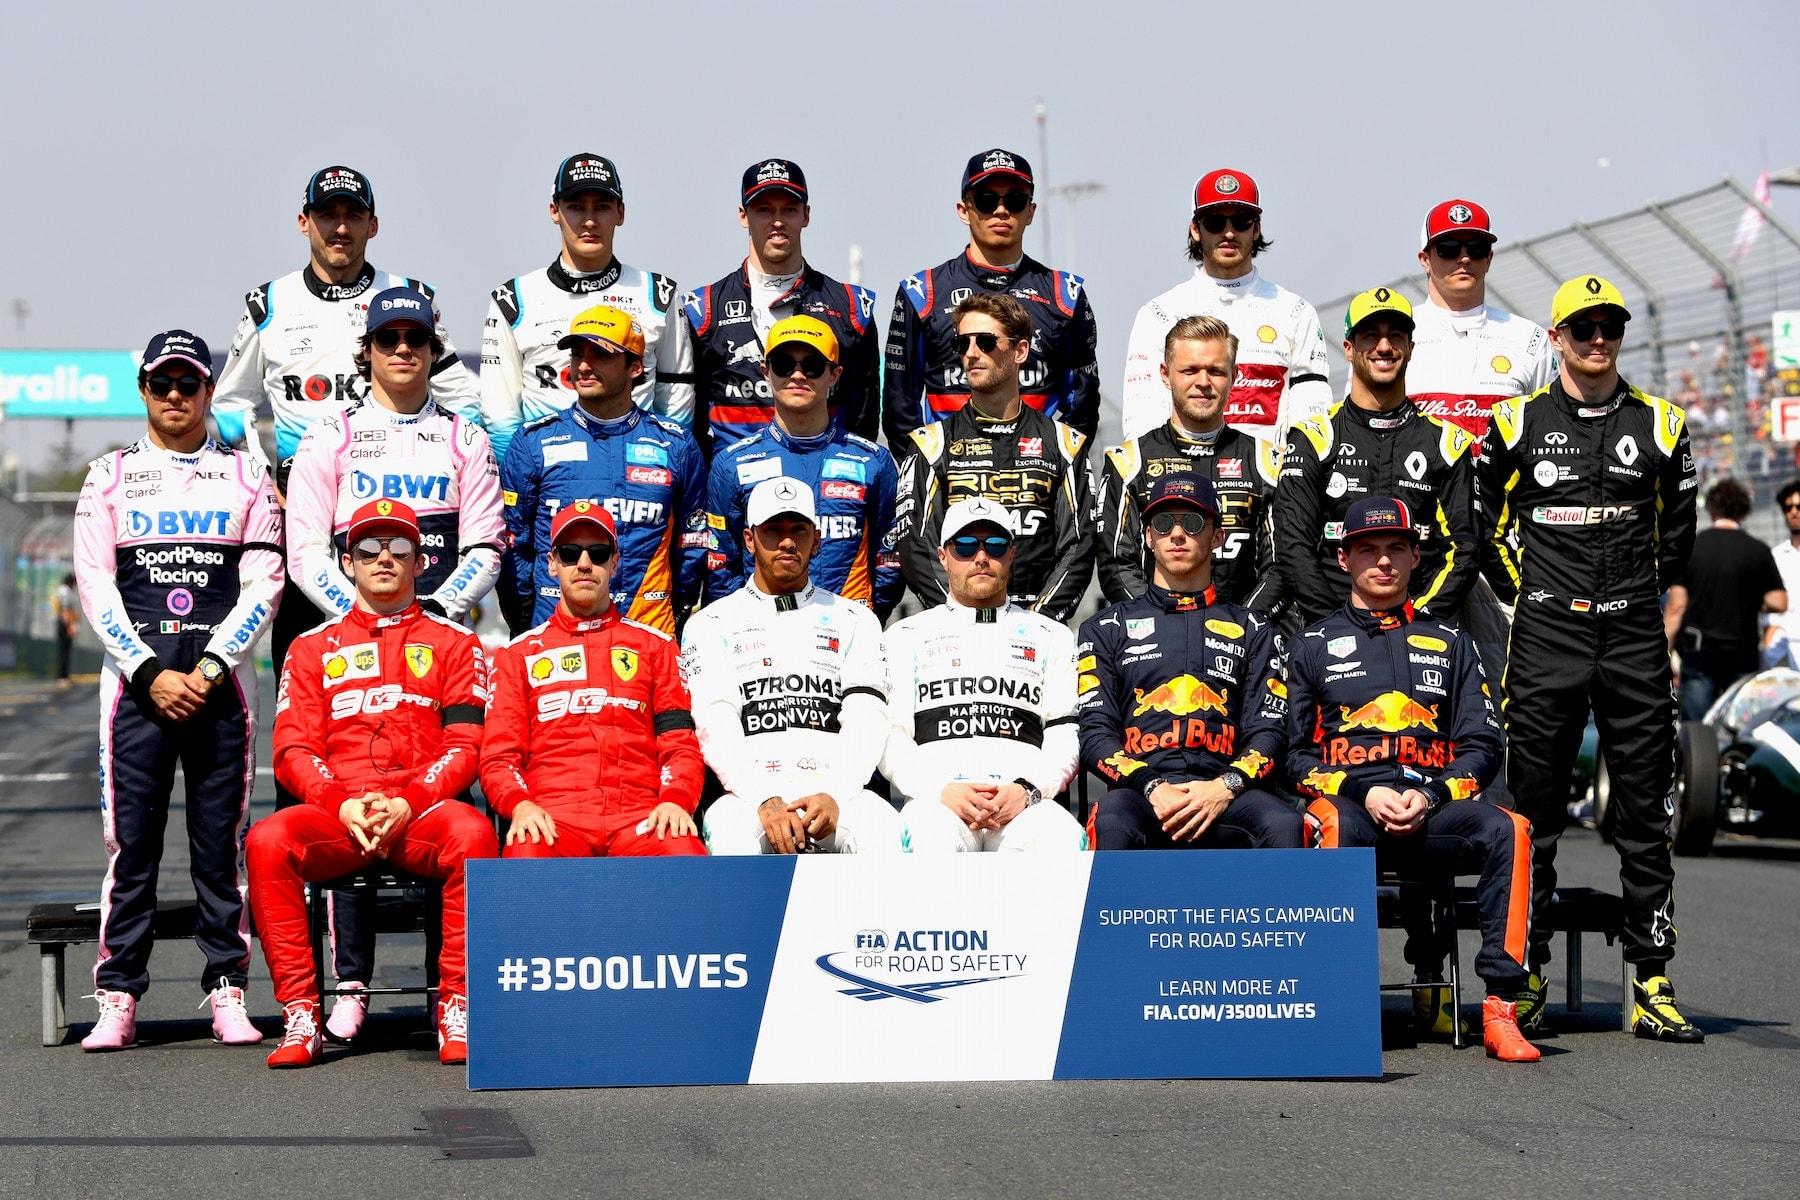 A 2019 F1 Class of 2019 | 2019 Australian GP Photo by Robert Cianflone copy.jpg